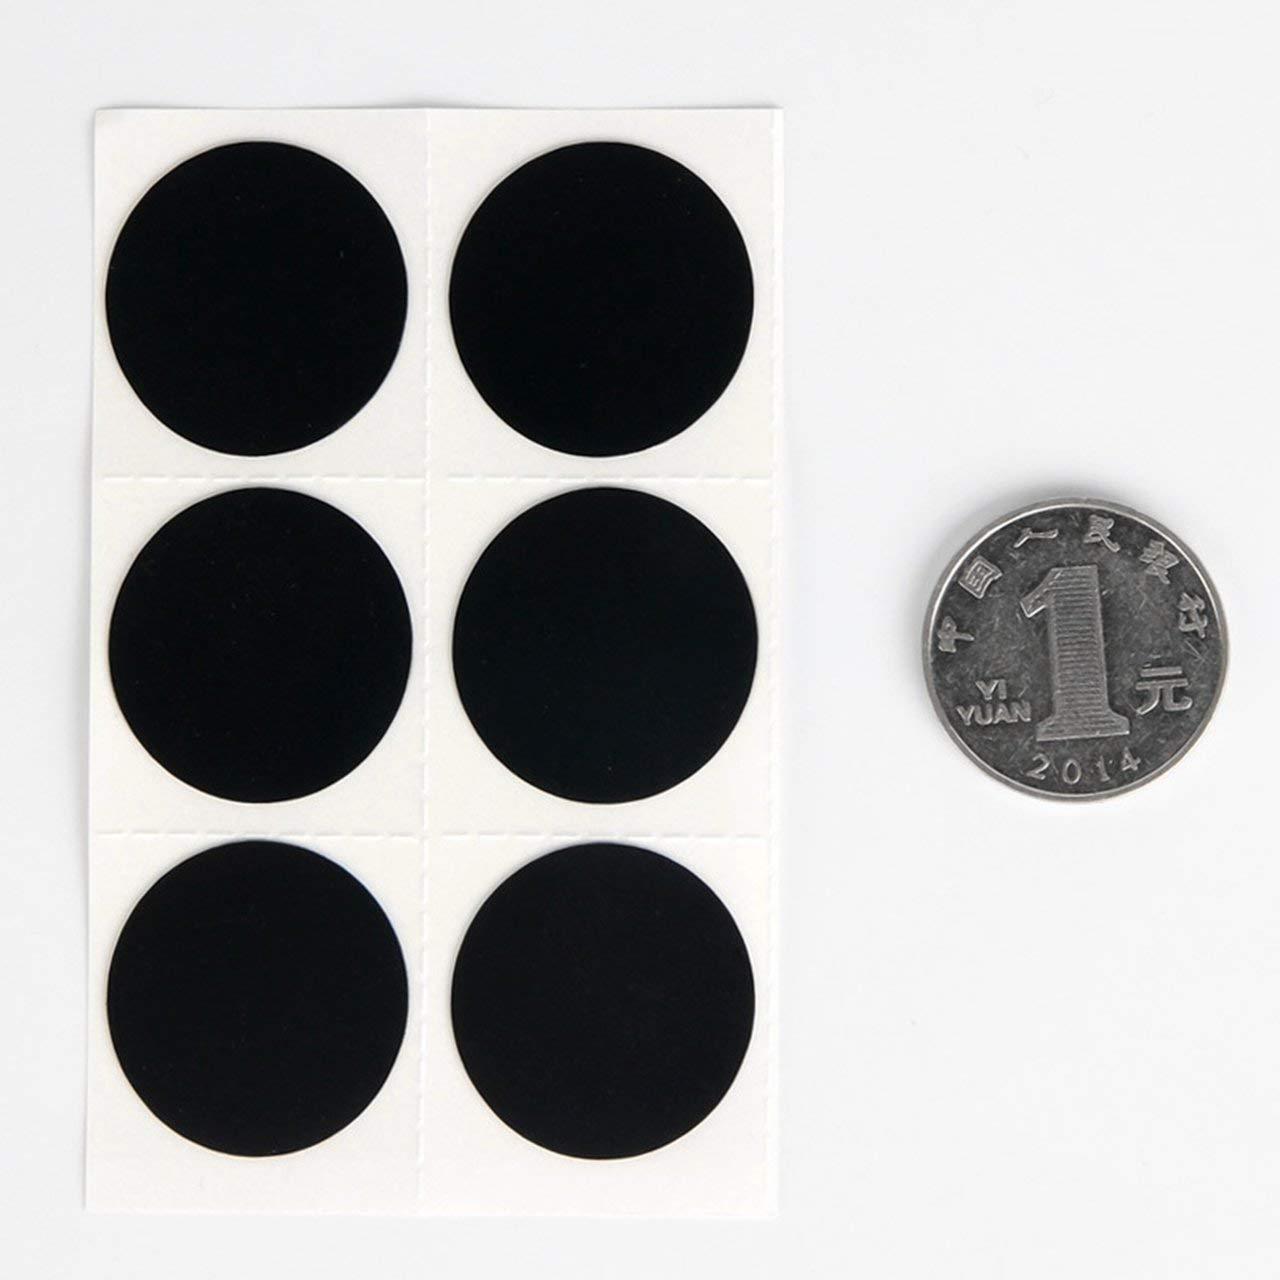 Noir Jasnyfall Nouveau No Glue Needed V/élo V/élo Pneu Crevaison Outil De R/éparation Kit Sticker-Patch